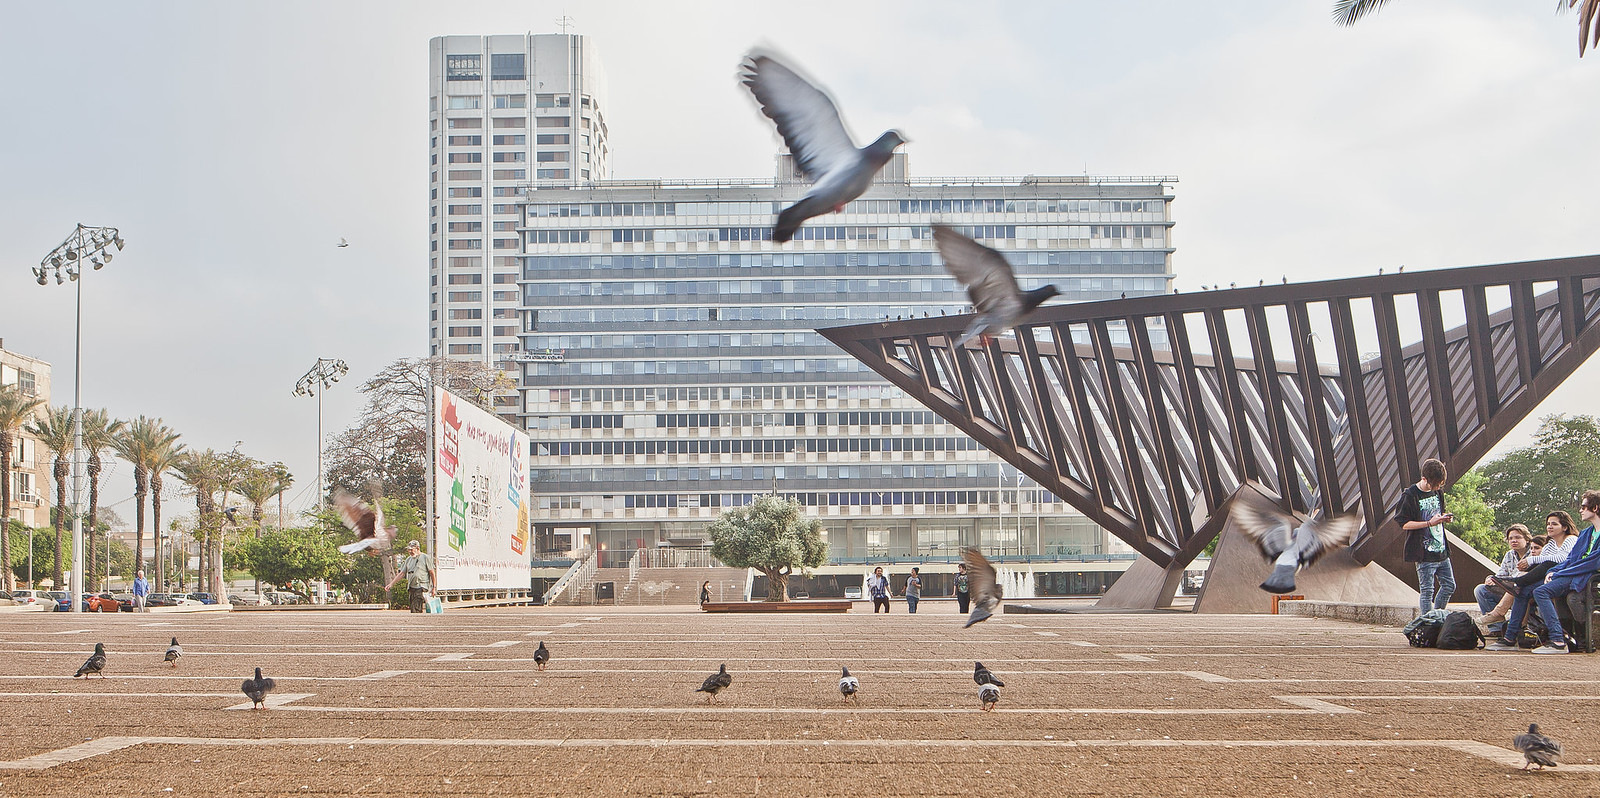 Tel Aviv_Rabin sq_ 1_Dana Friedlander_IMOT